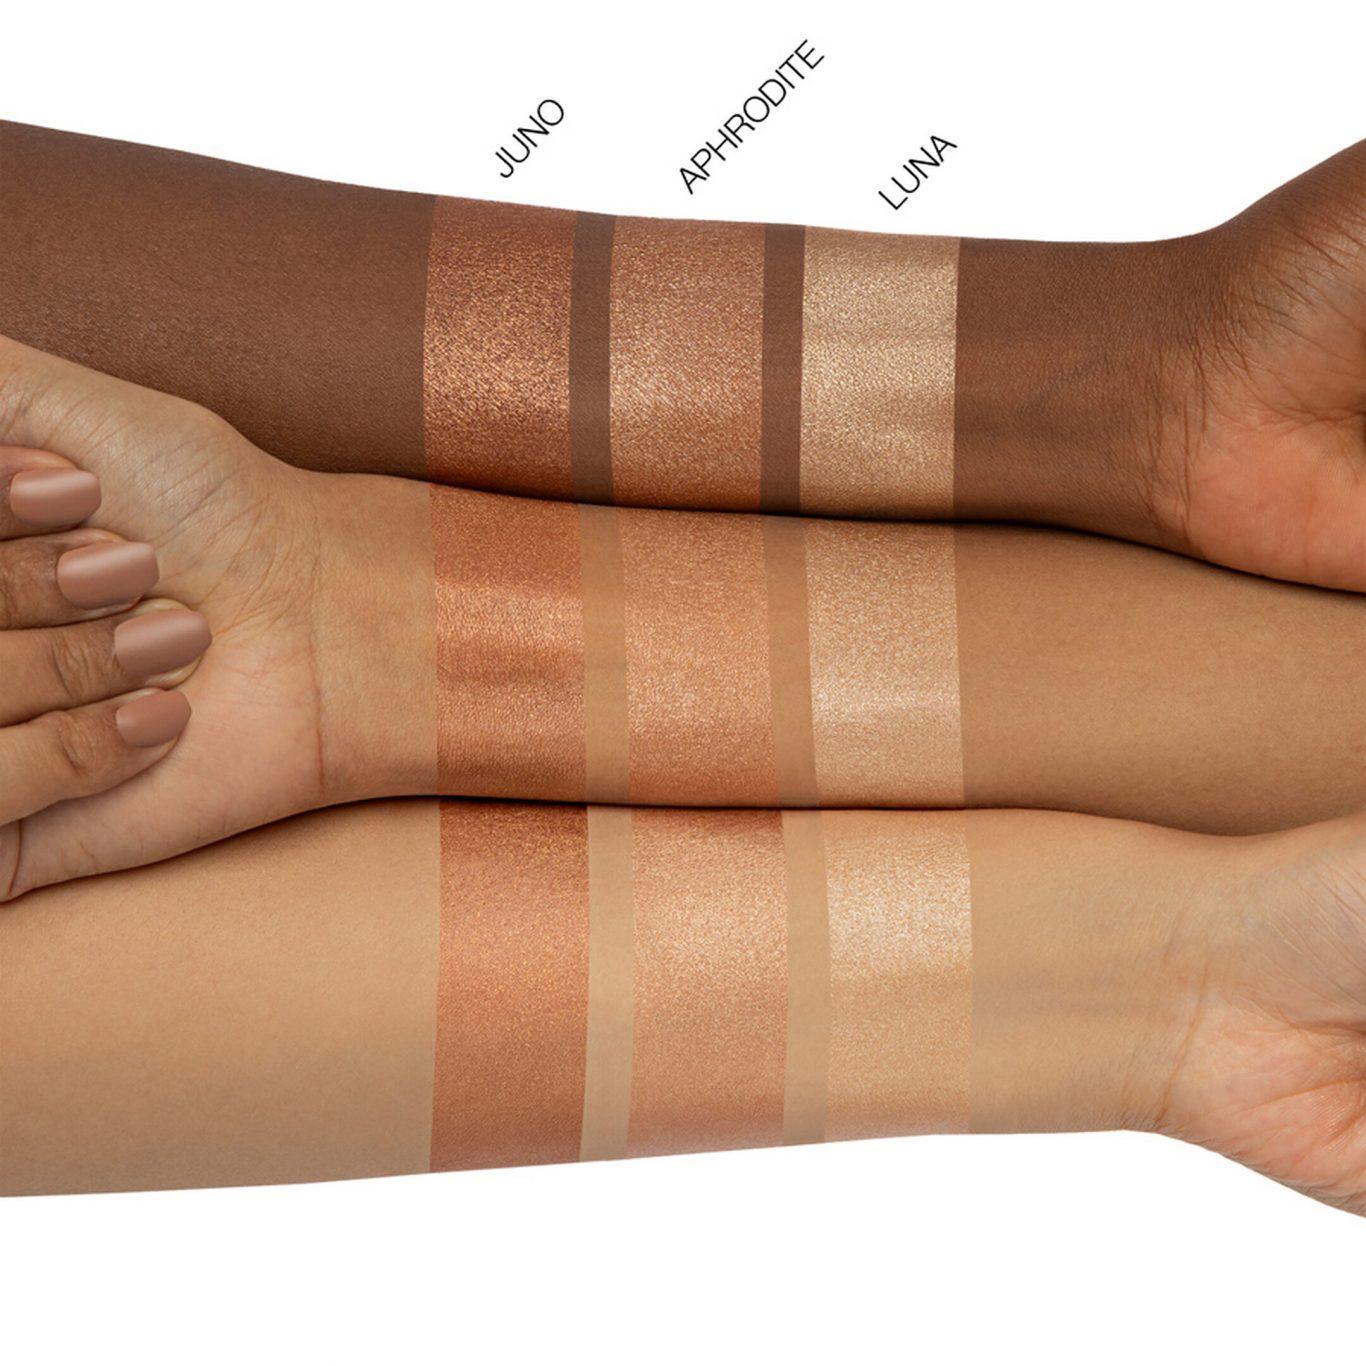 N.Y.M.P.H. GLAZE Skin Glowing Perfector Arm Swatches